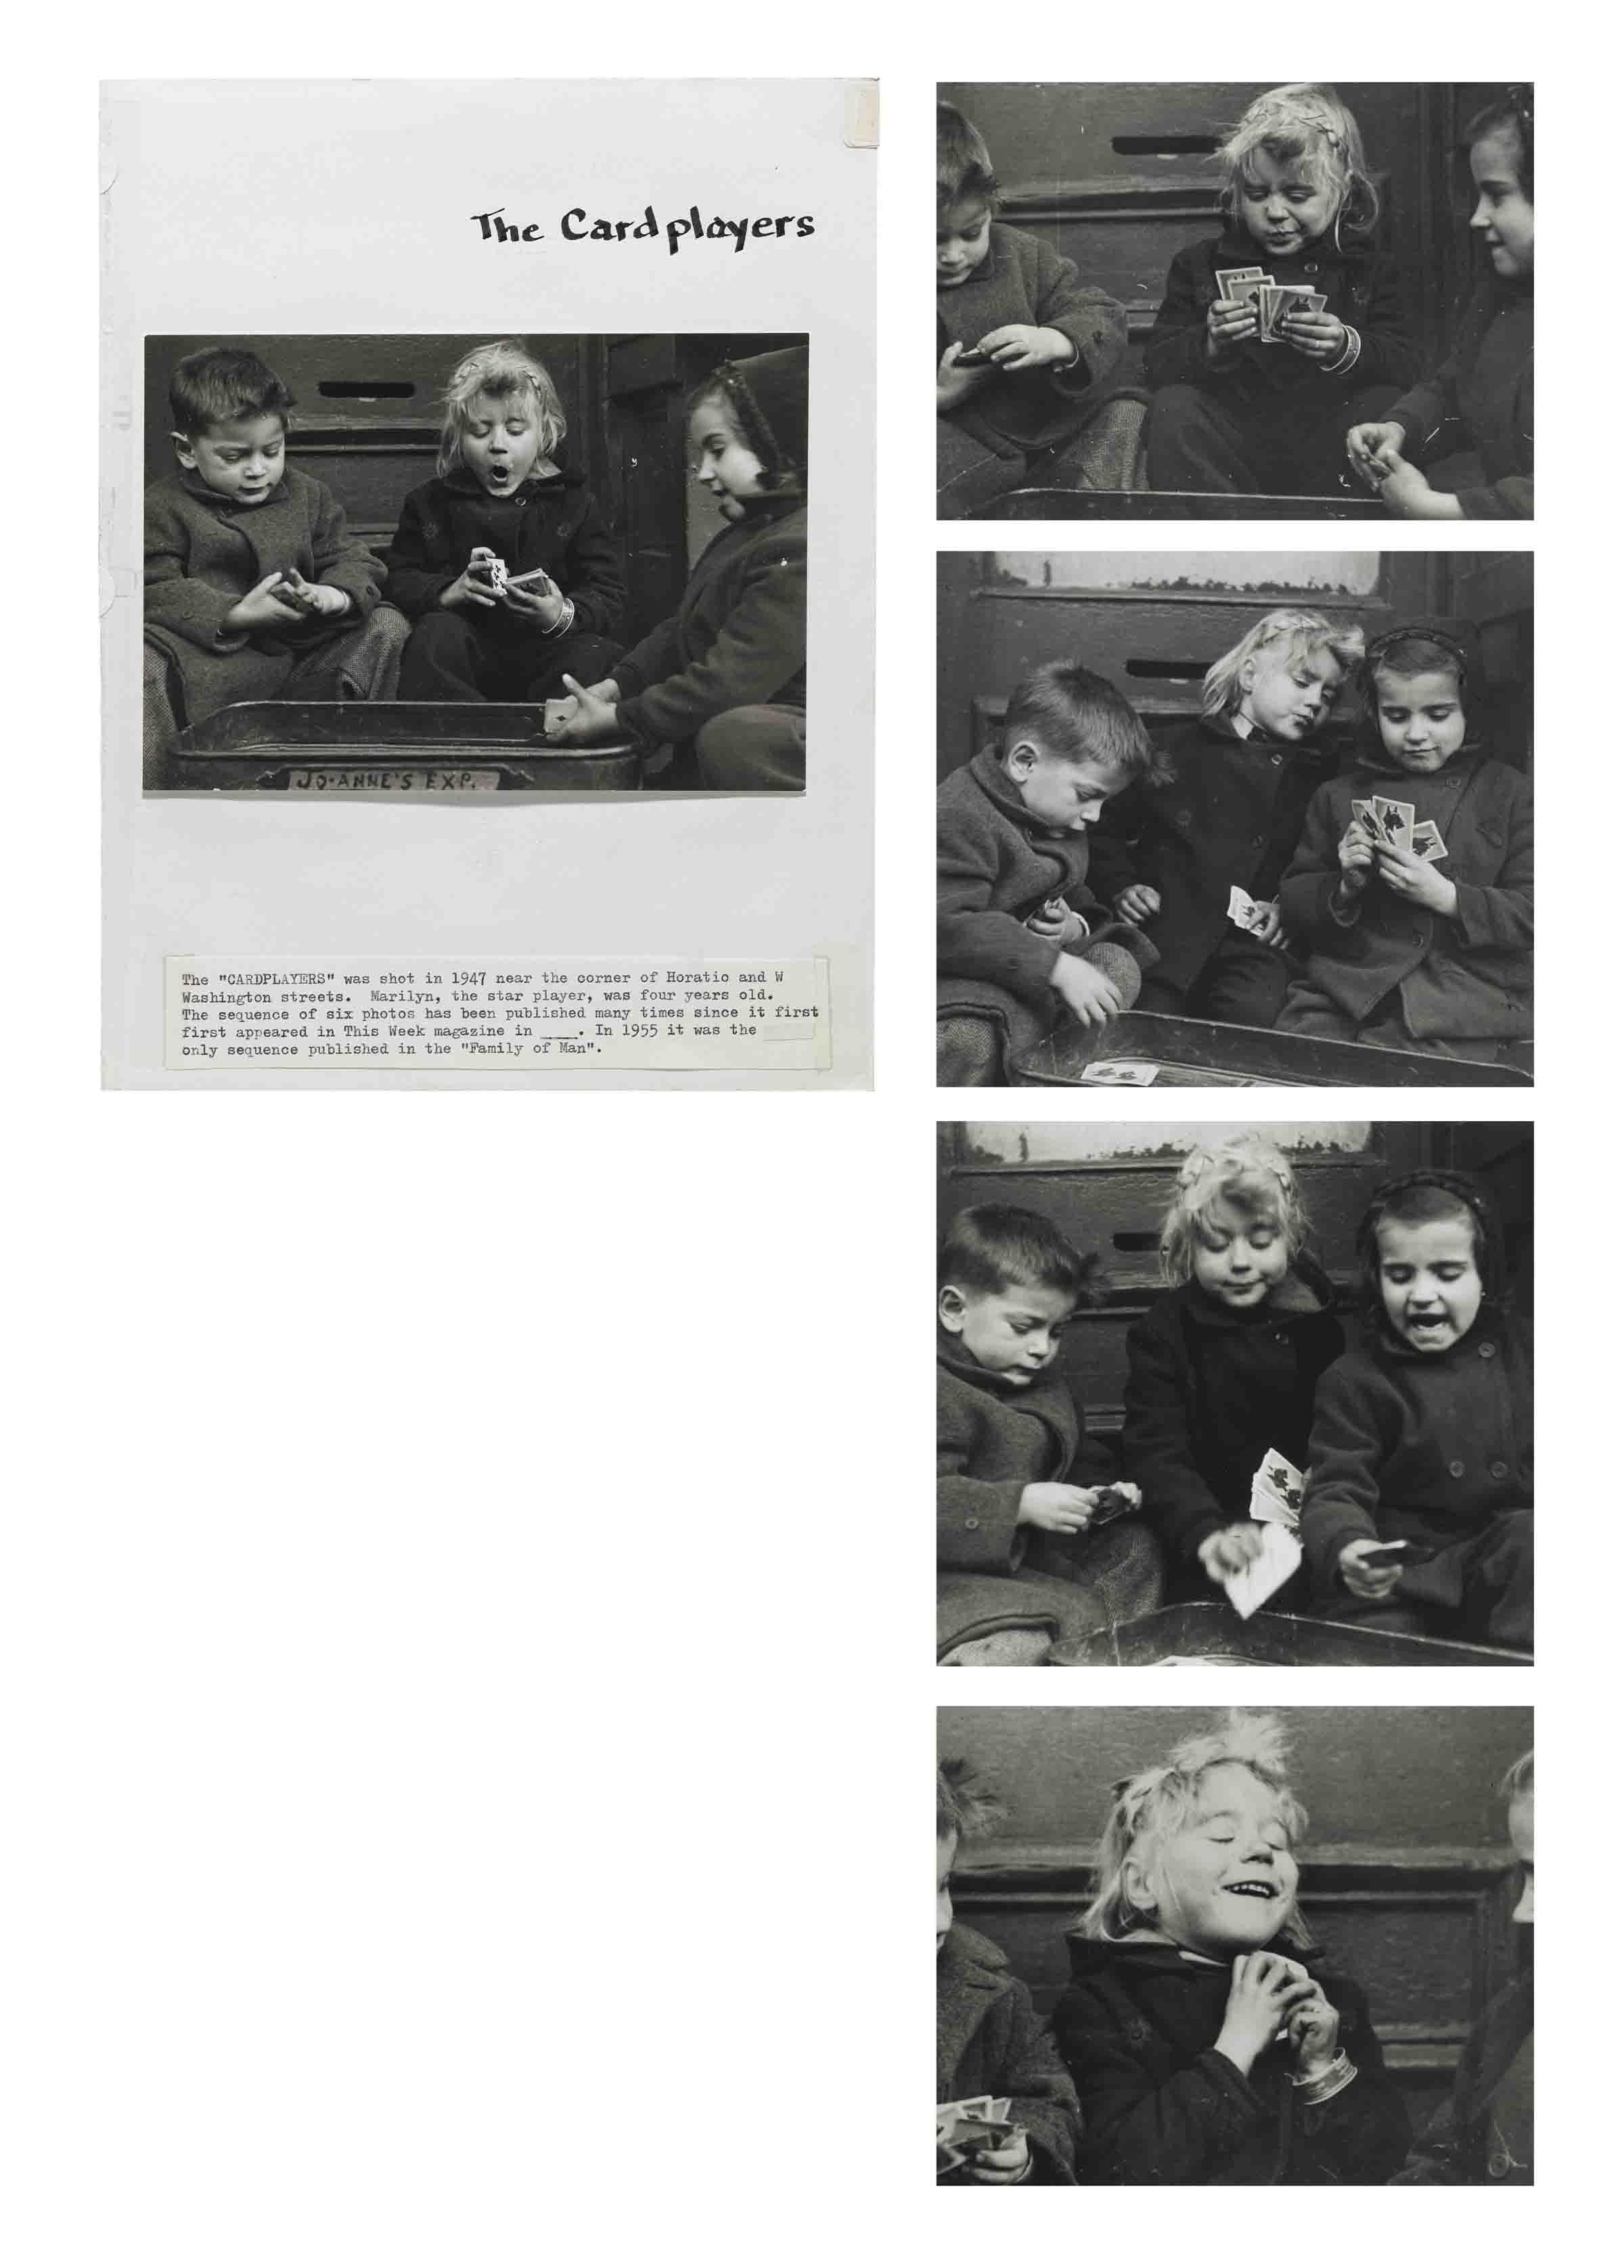 The Cardplayers, 1947